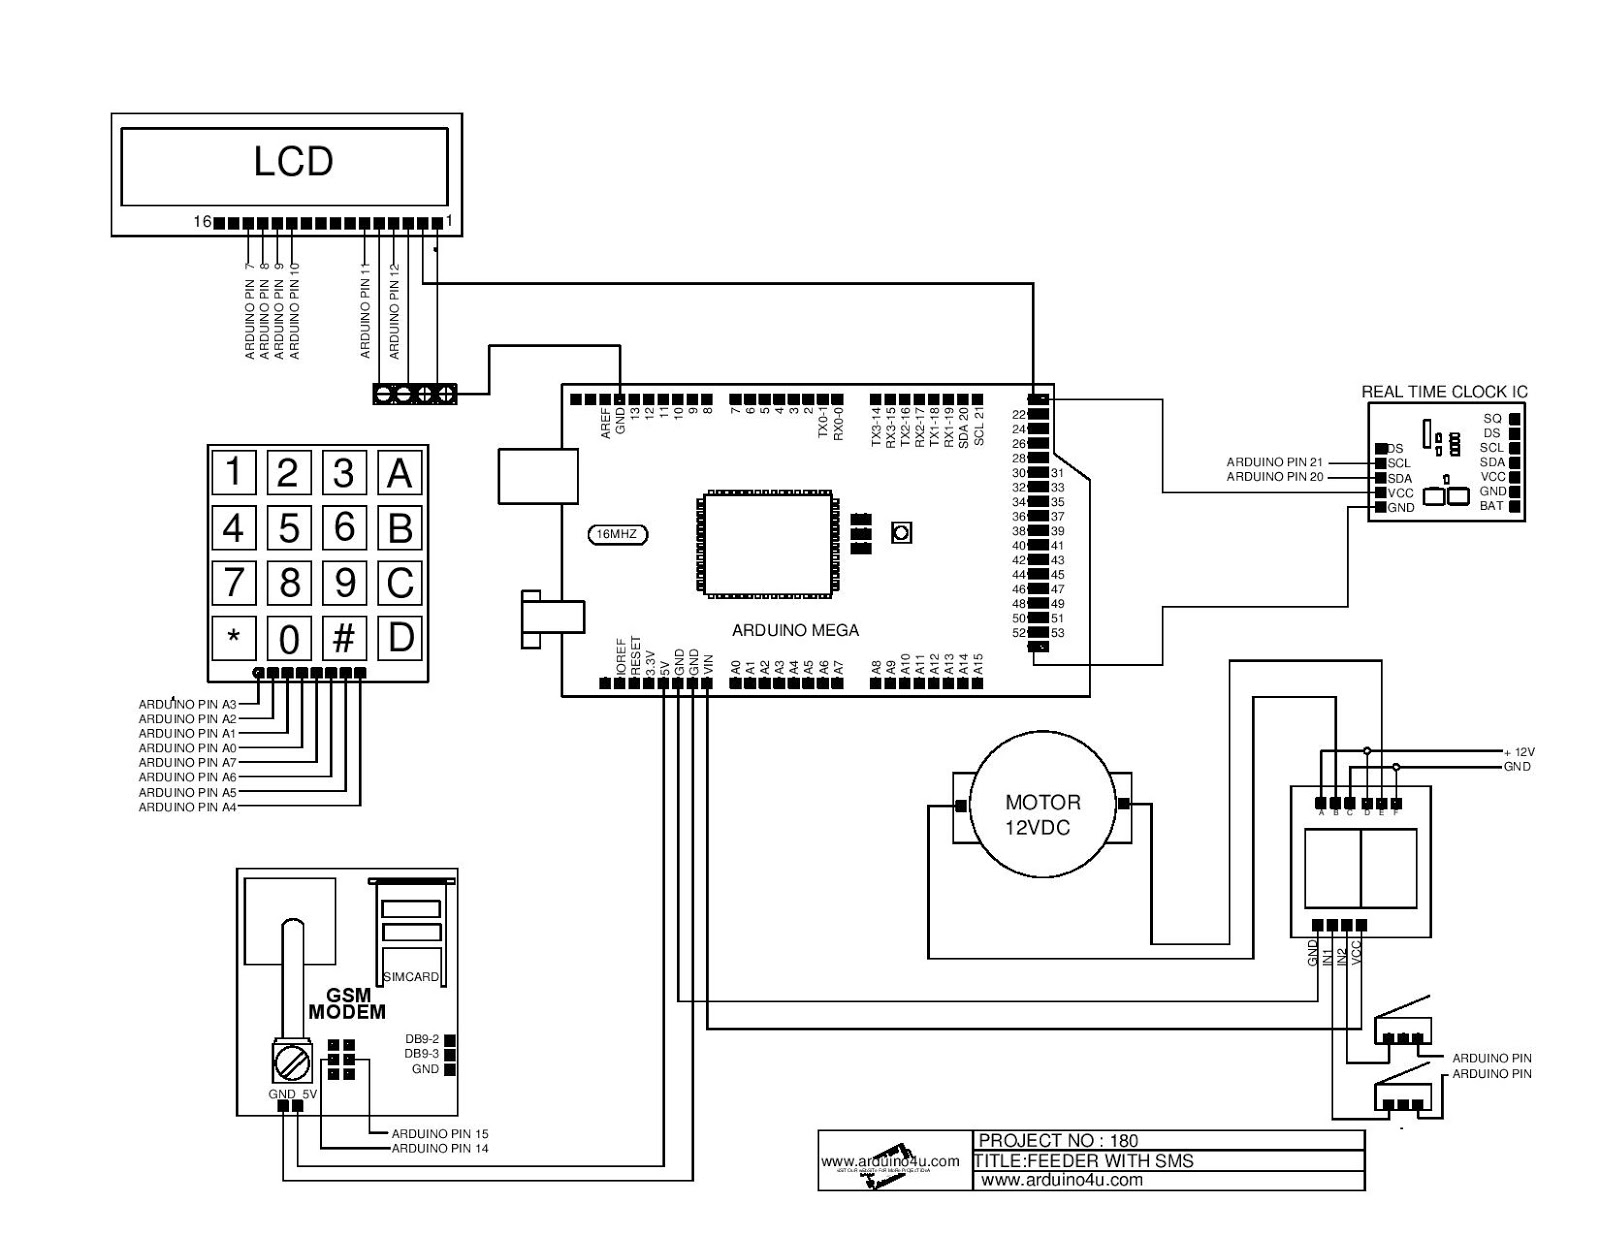 Projek Elektronik Arduino4u.com: 180-Feeder With SMS System